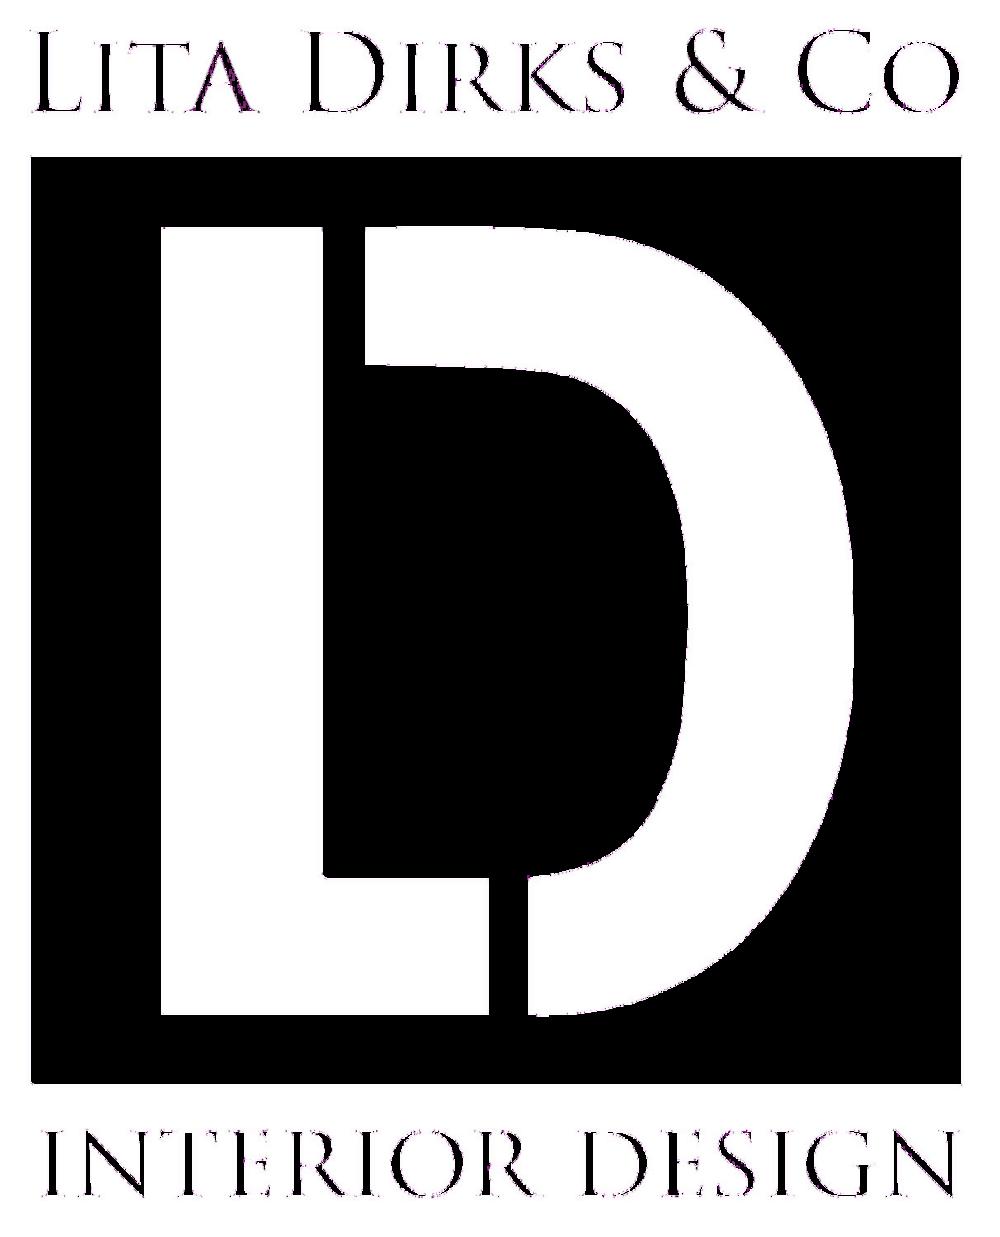 Lita Dirks & Co. Interior Design and Merchandising Firm